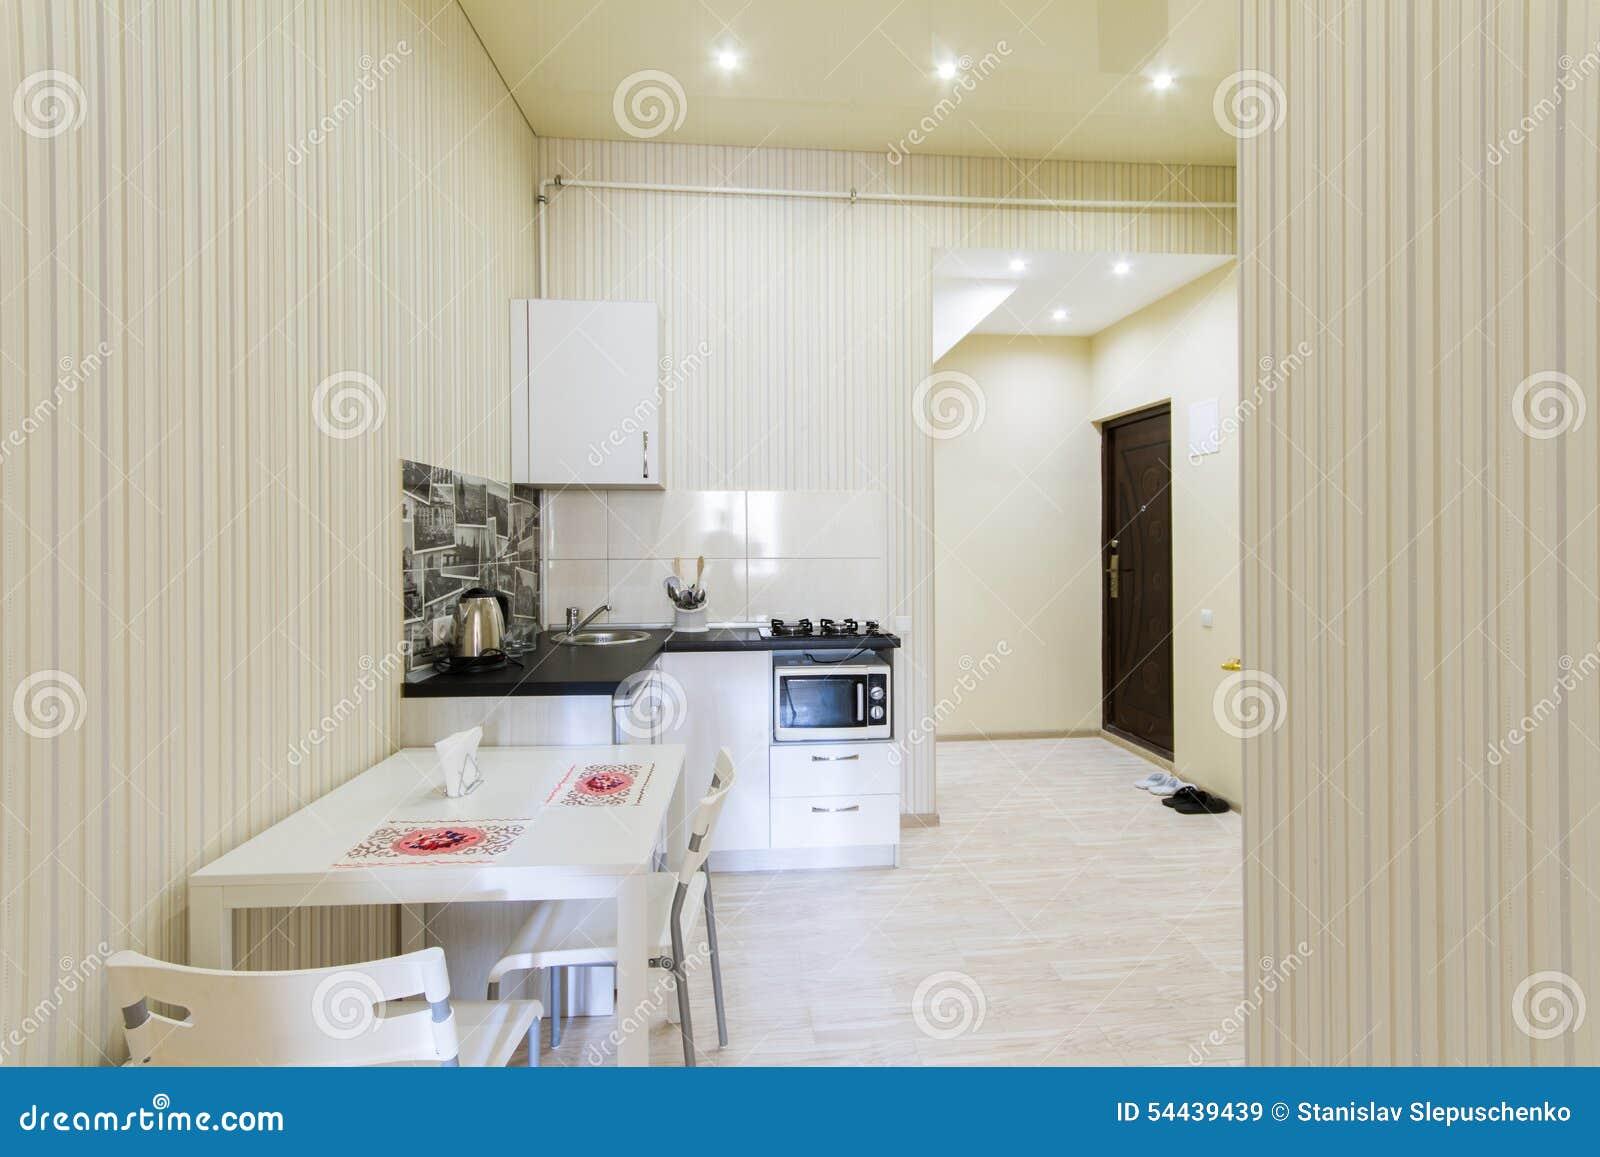 Small Kitchen For Studio Apartment Small Kitchen In A Studio Apartment Stock Photo Image 54439439